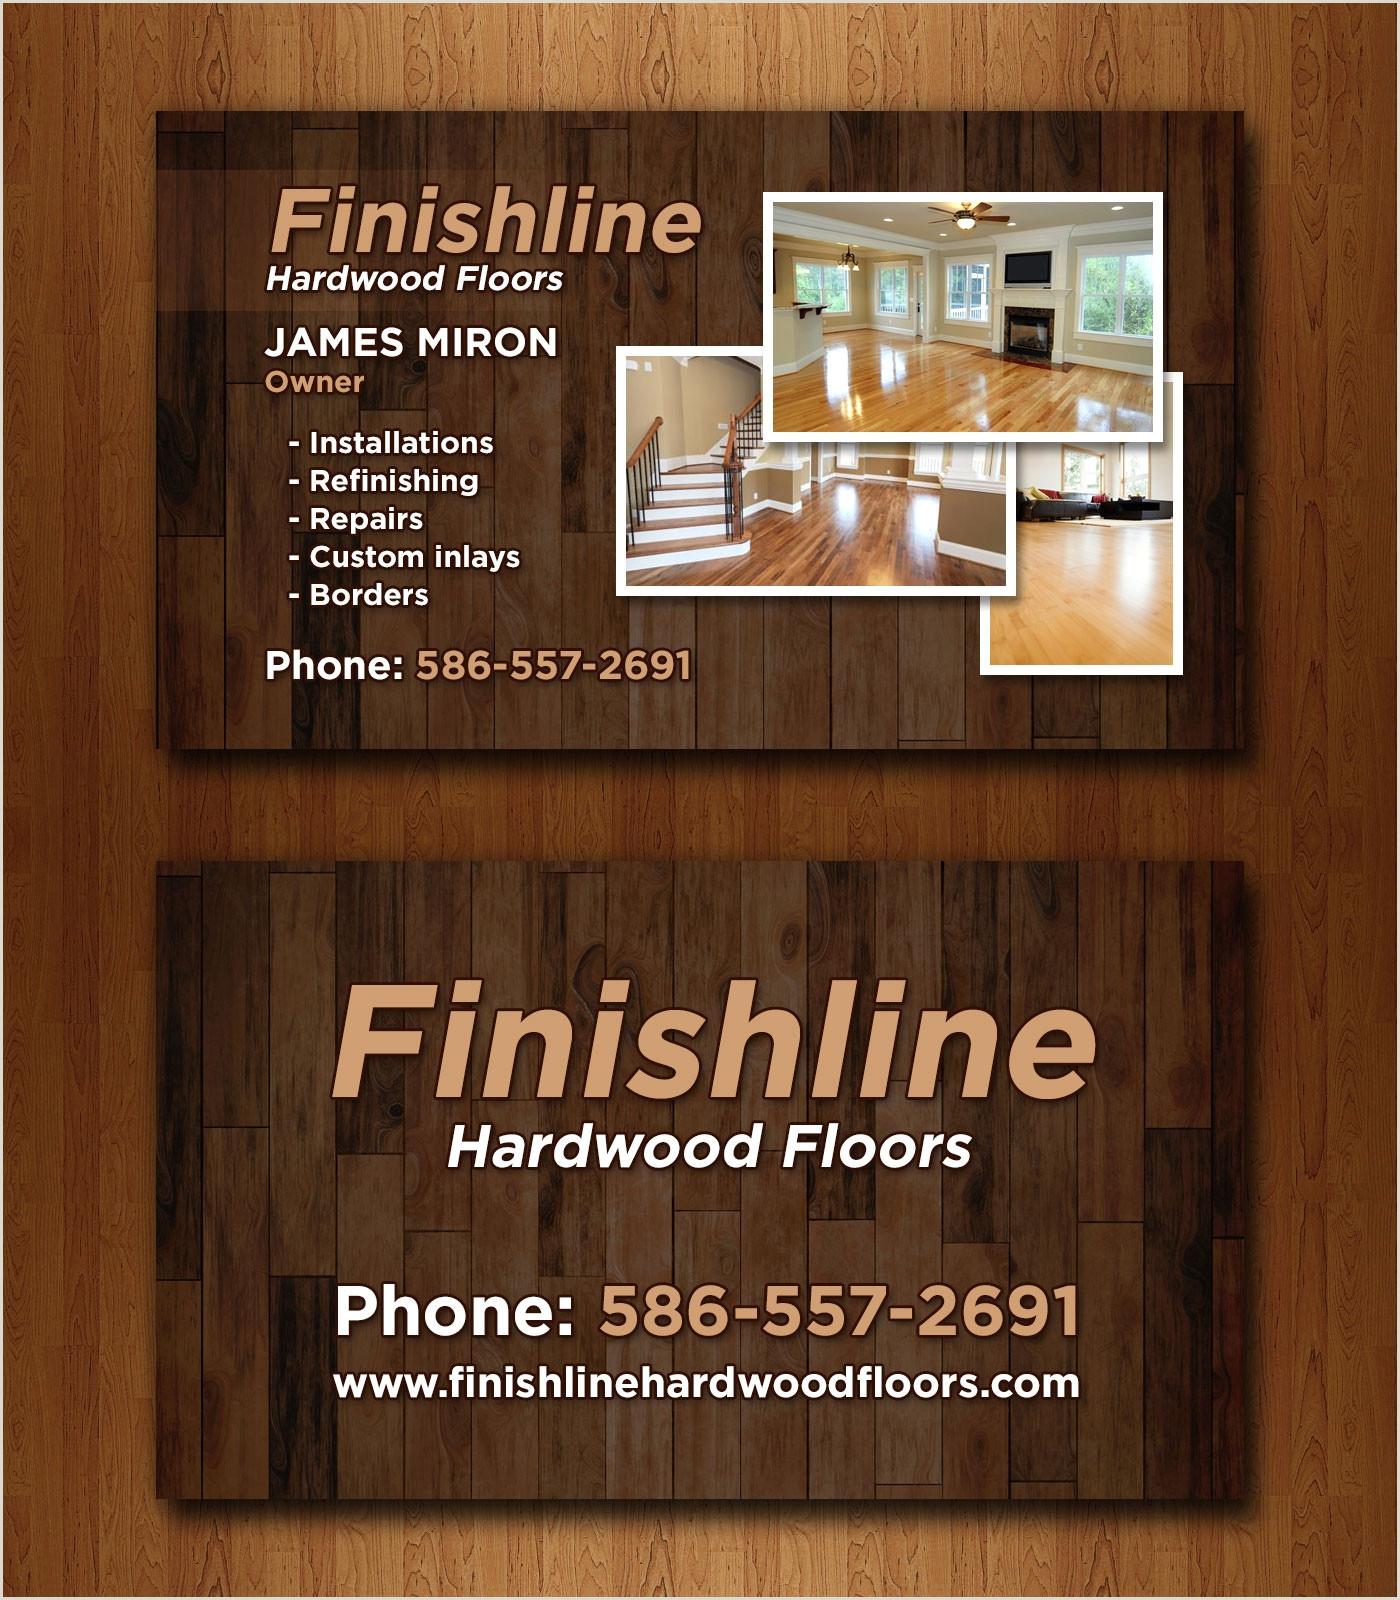 Get Business Cards Made Same Day 14 Popular Hardwood Flooring Business Card Template